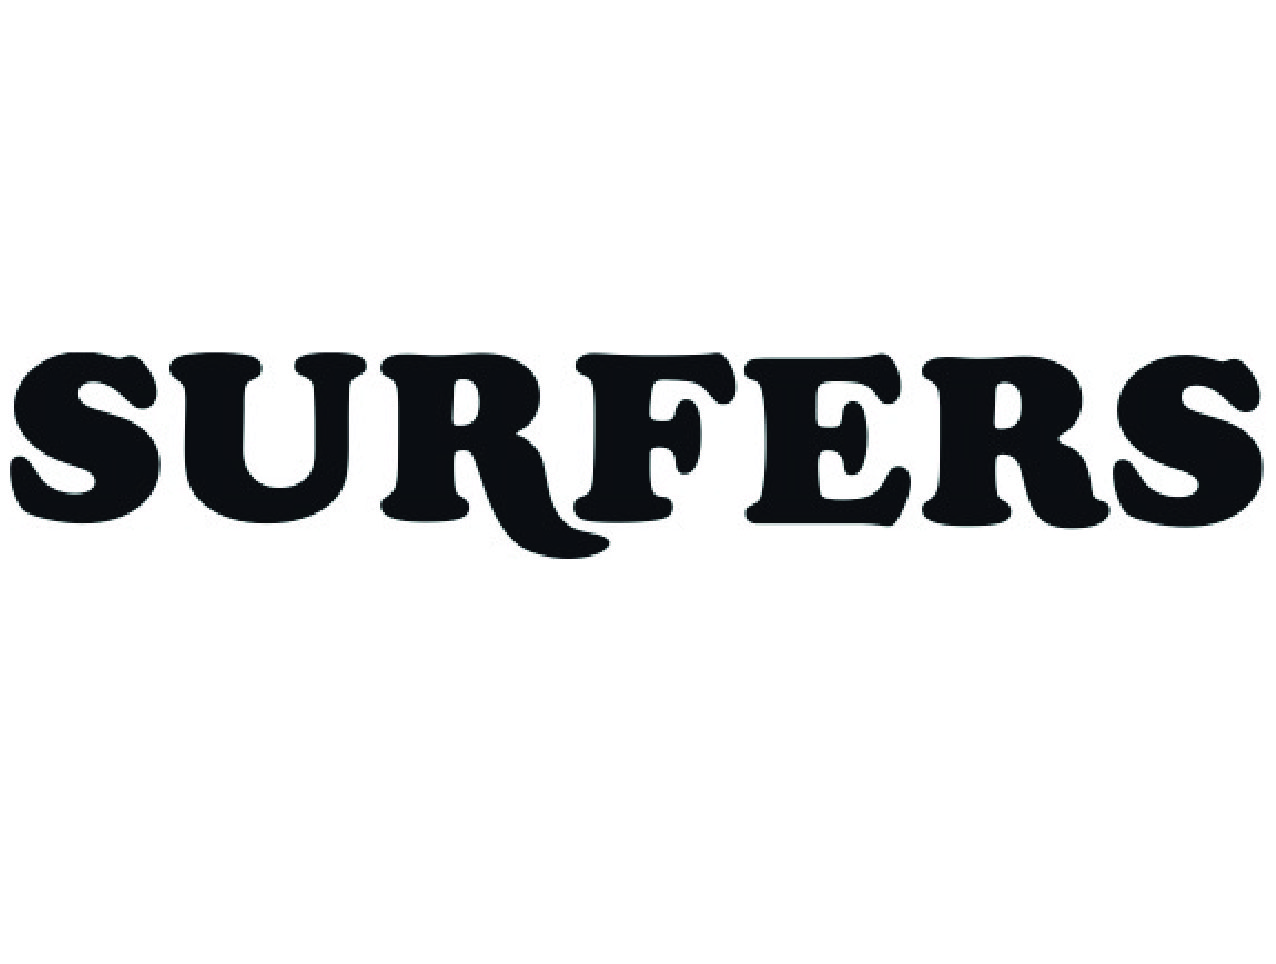 Surfers logga hemsida.jpg